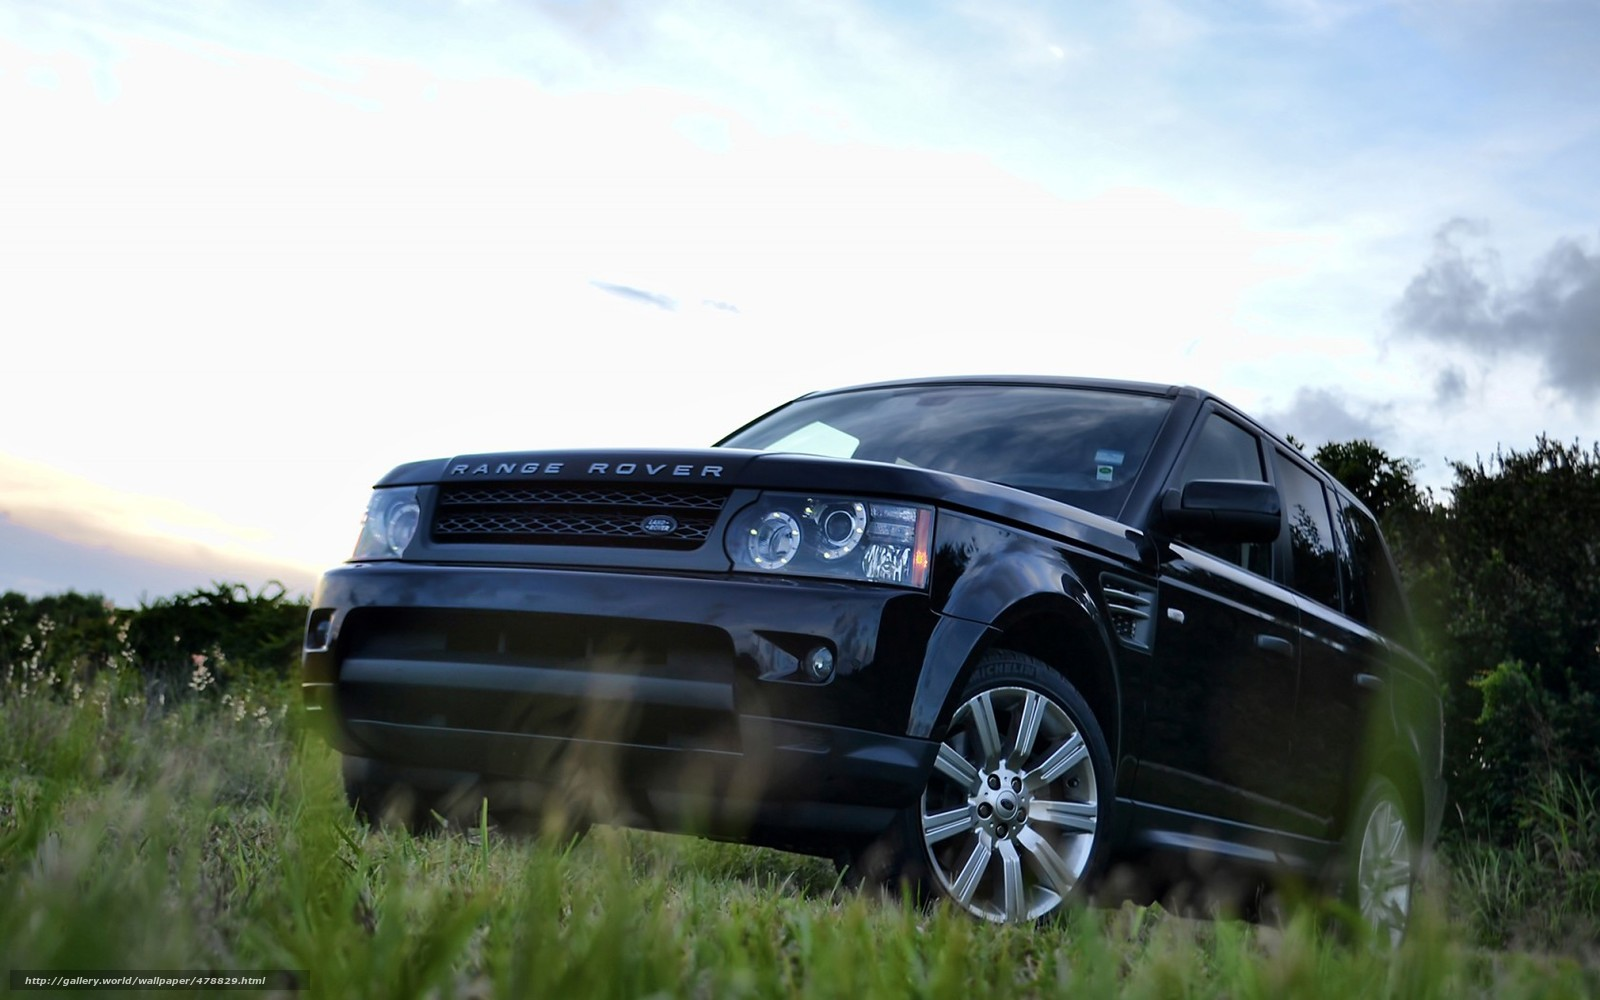 Range Rover Sport Black Wallpaper: Download Wallpaper Range Rover, Land Rover, Sport, Black